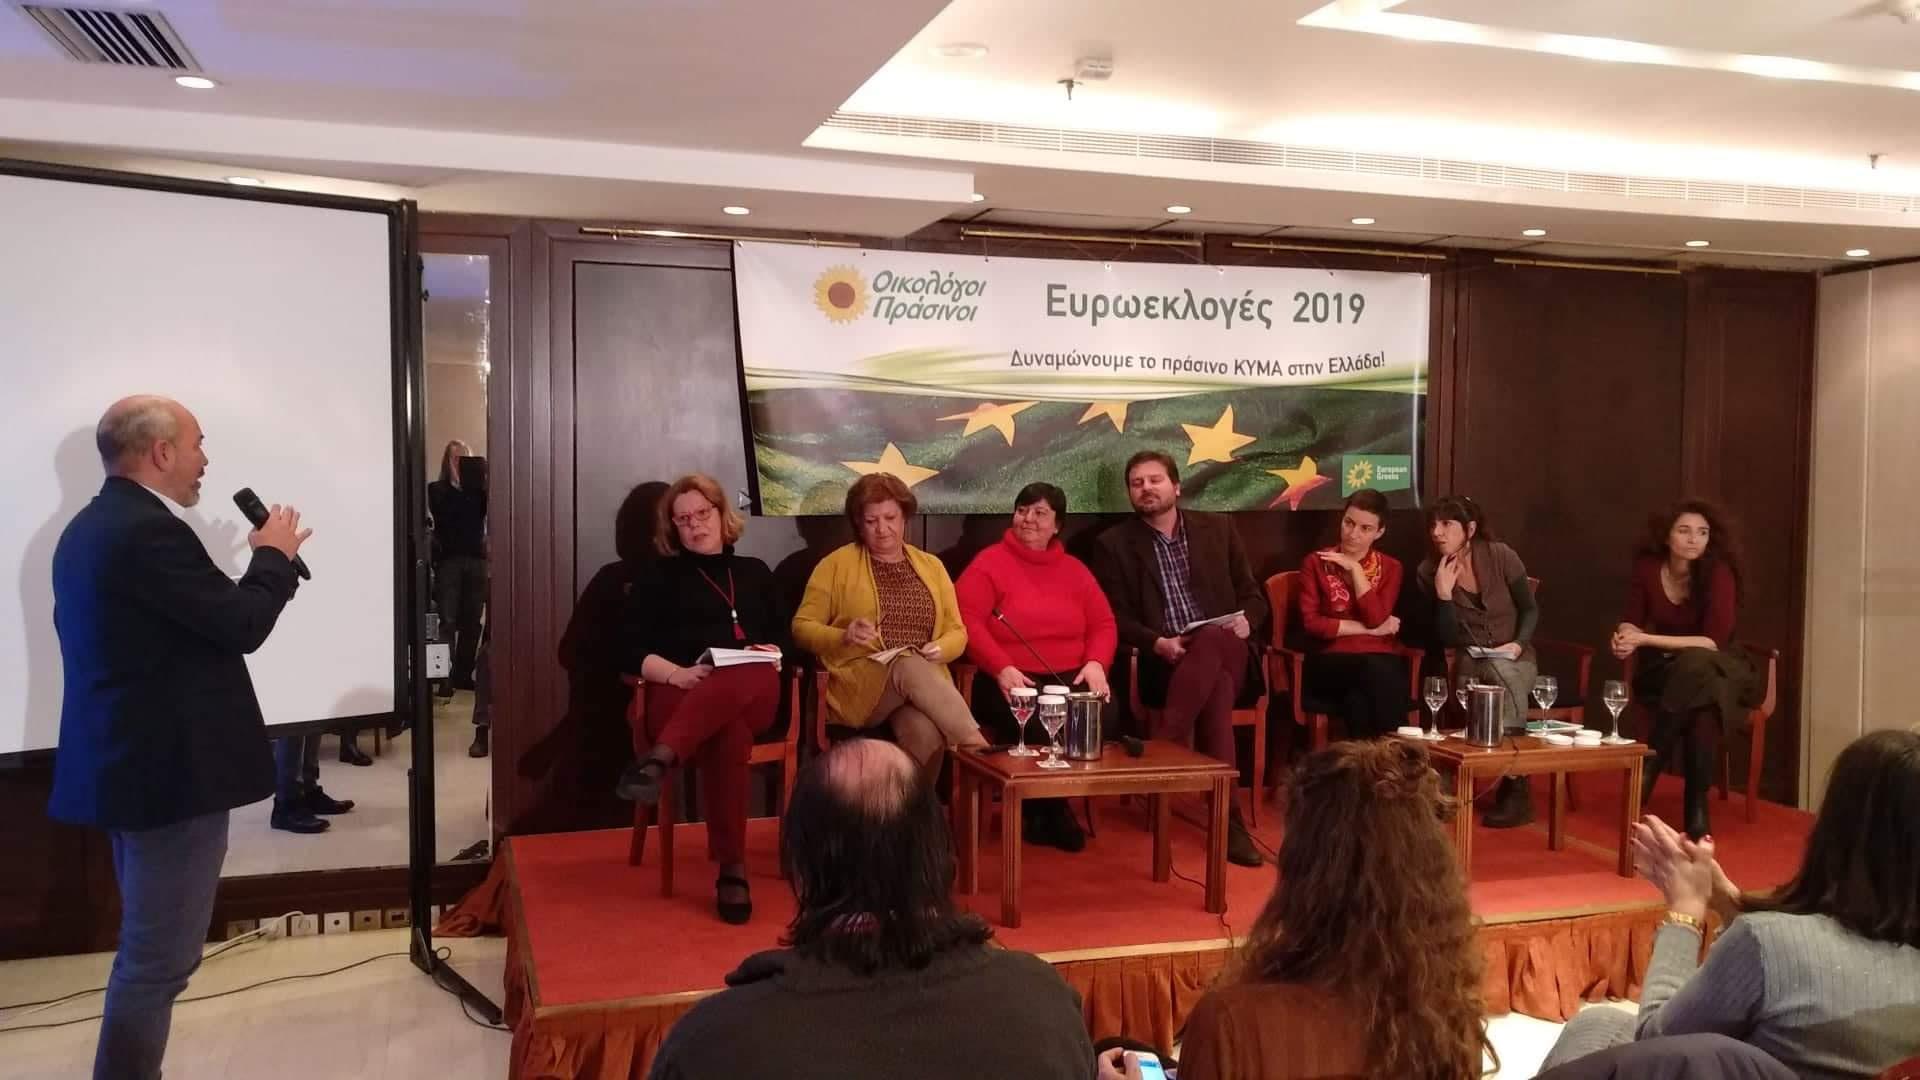 c91c61674e52 Με επιτυχία πραγματοποιήθηκε η Εκδήλωση – Συζήτηση με την Σκα Κέλλερ «Το  Πράσινο -Κύμα είναι εδώ»